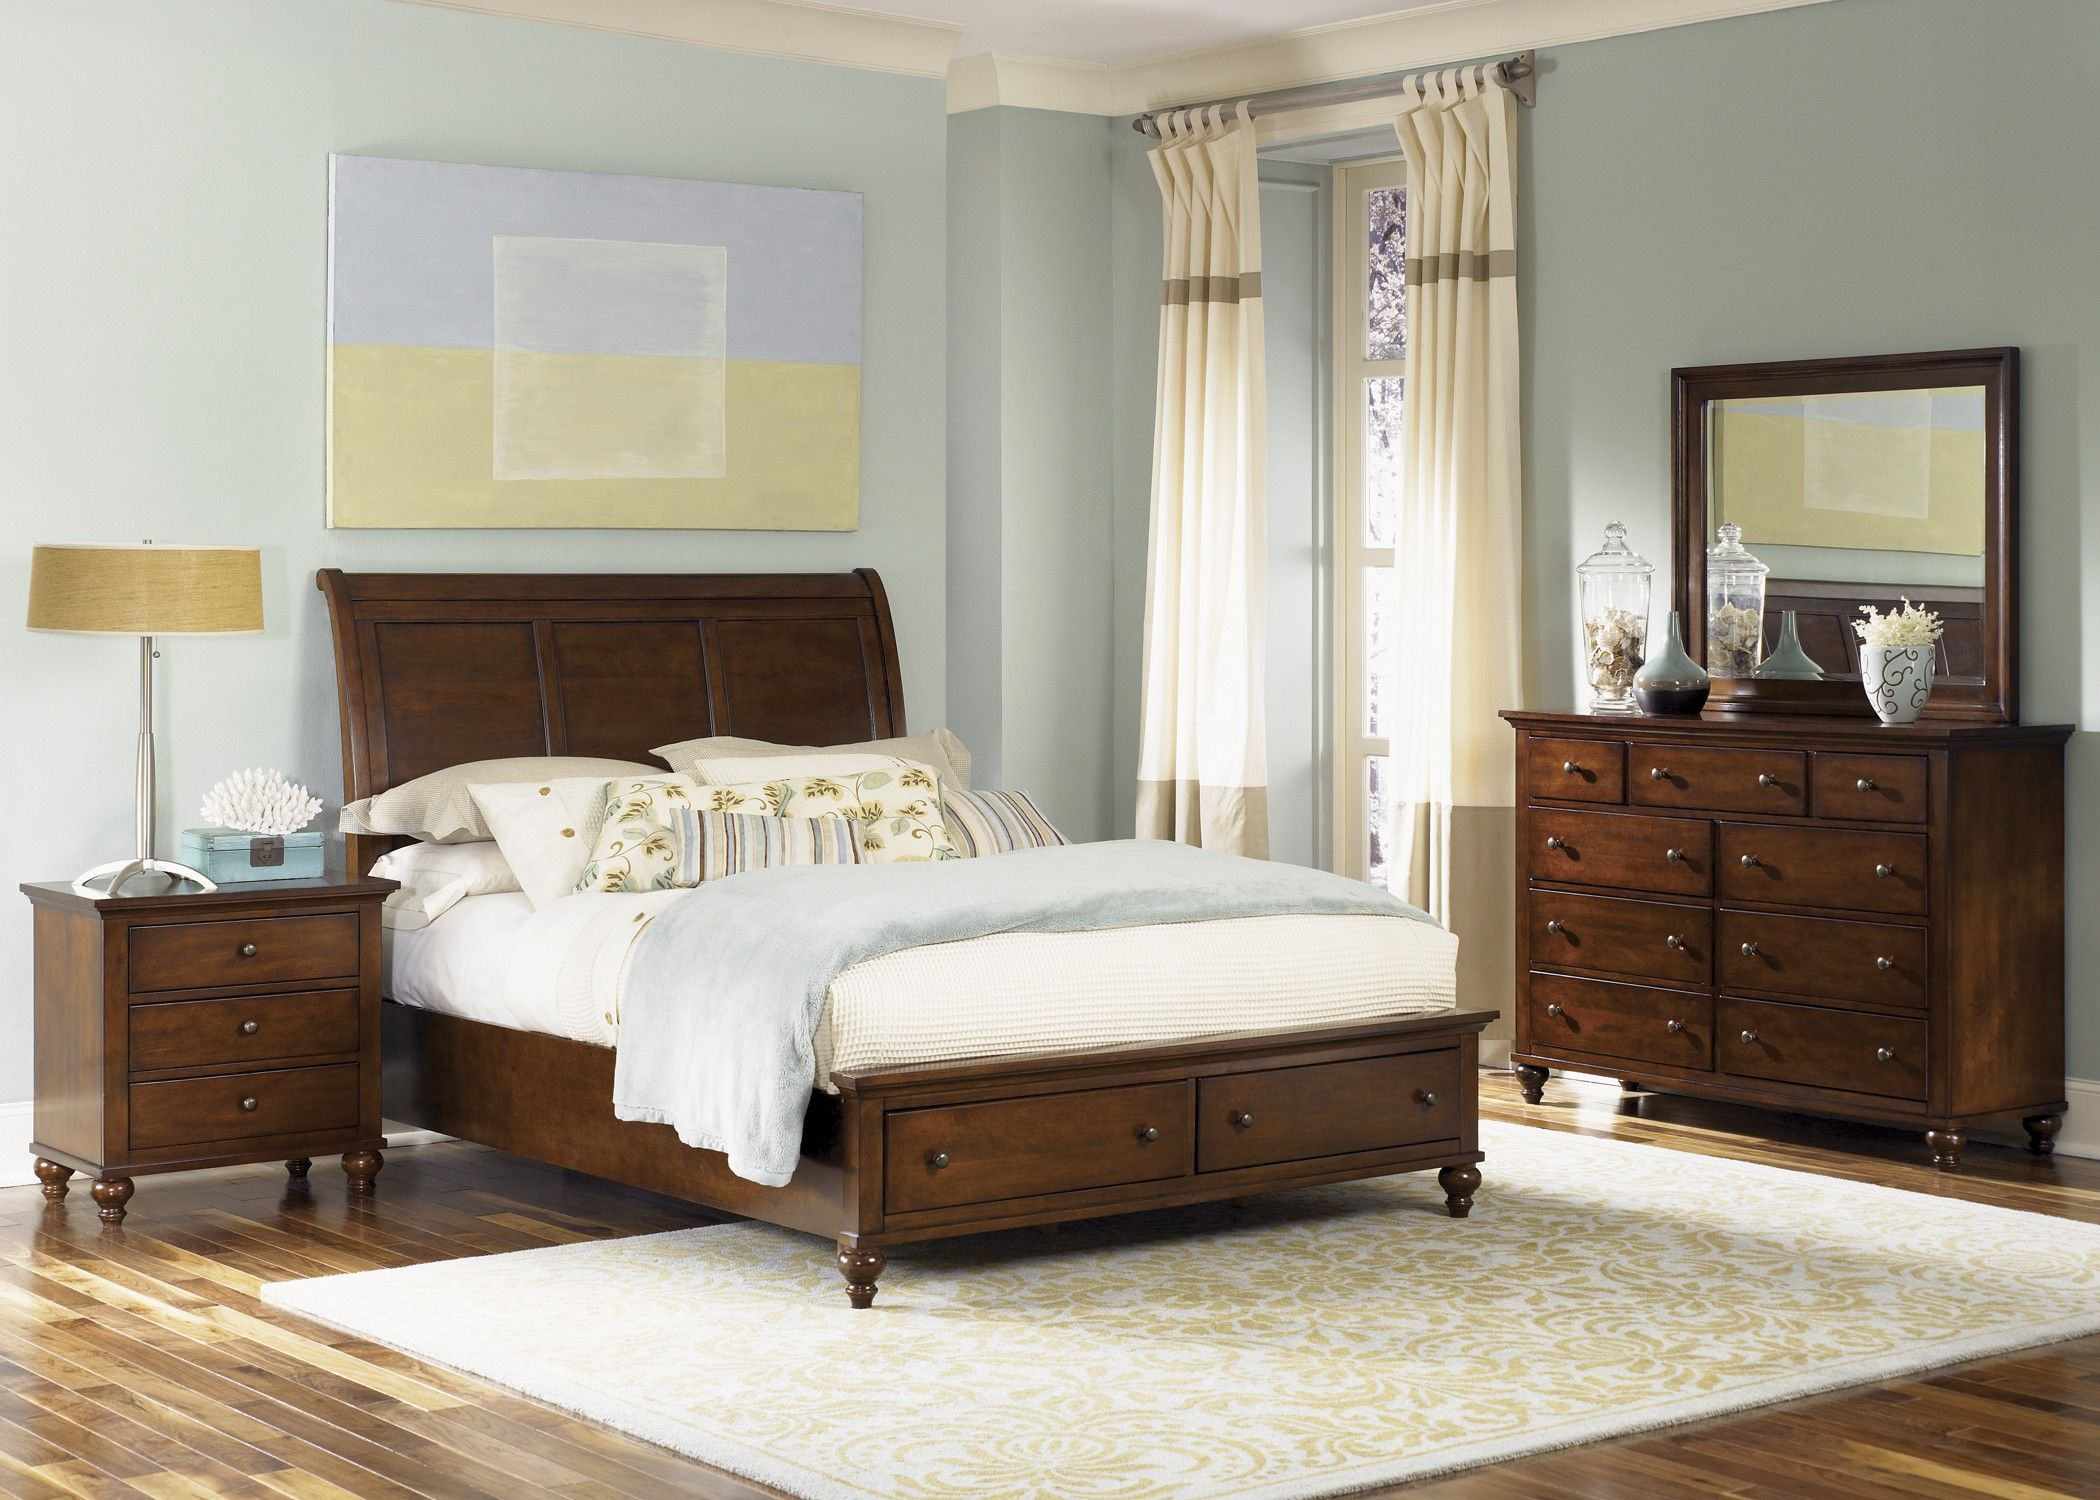 Hamilton King Sleigh Storage Bed Bedroom Furniture Sets Liberty Furniture Bedroom Sets